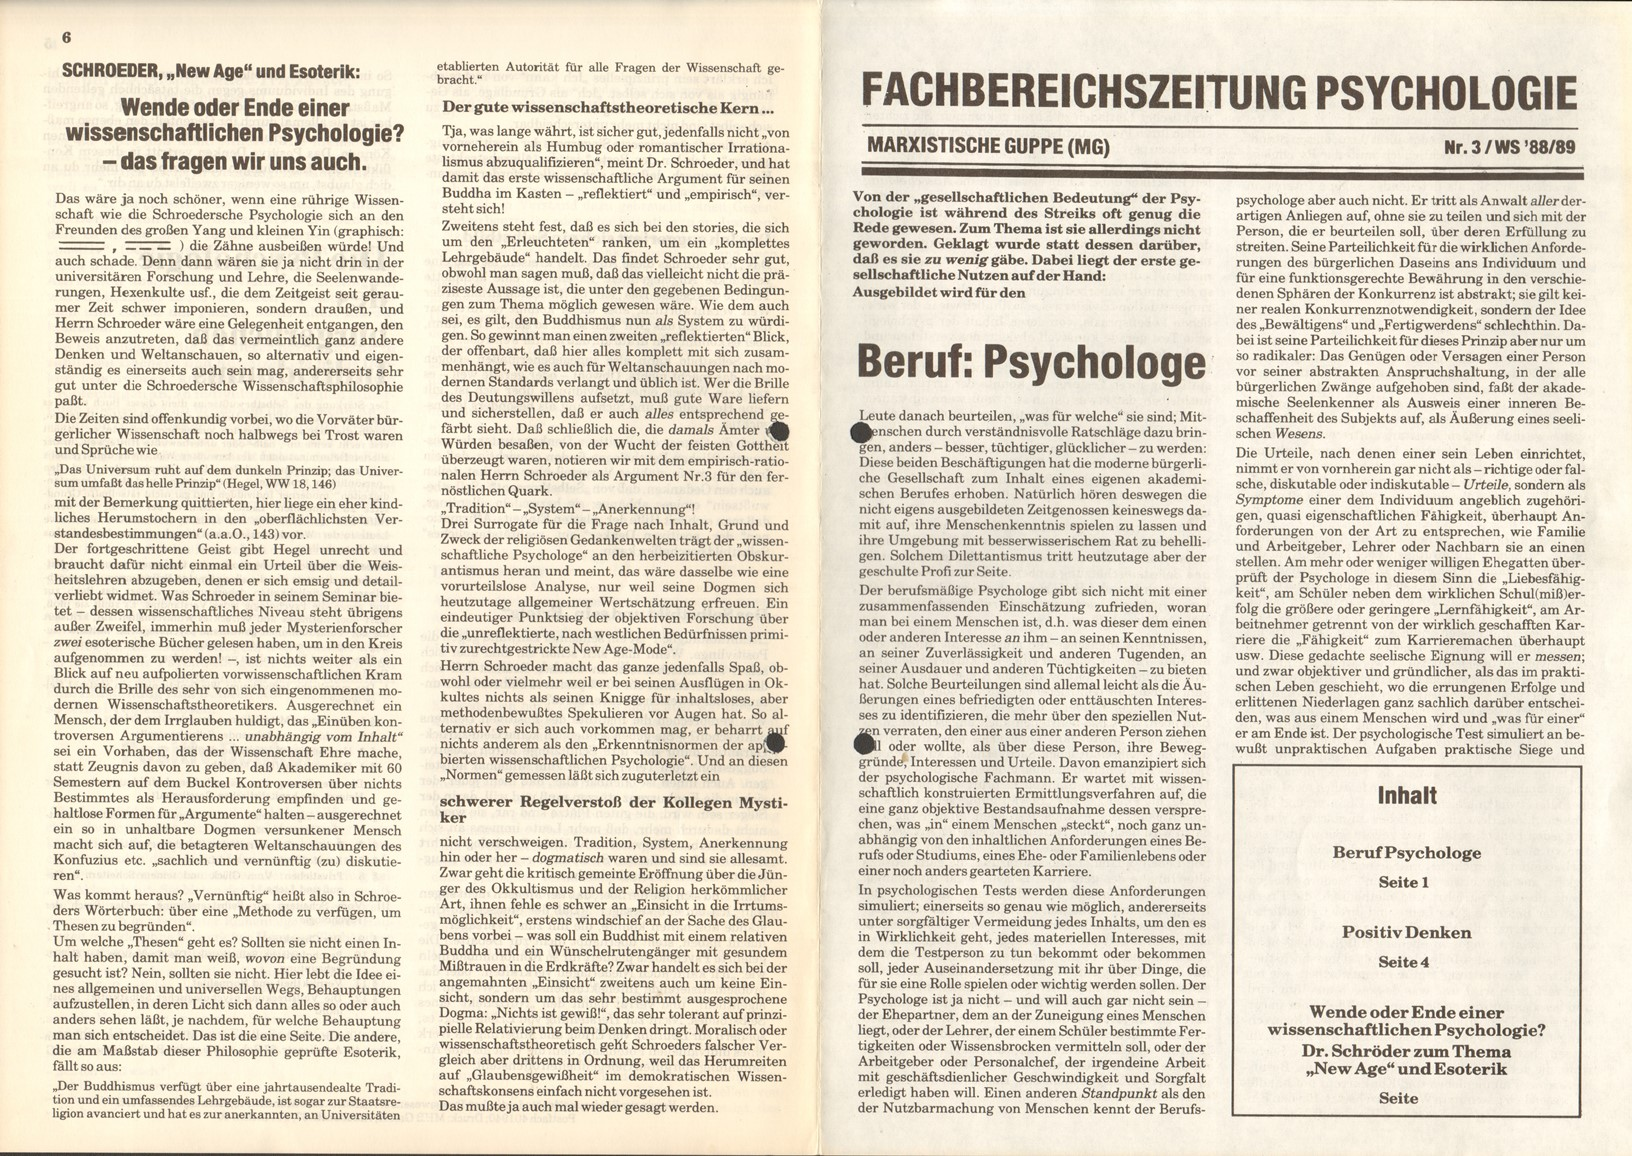 Muenchen_MG_FB_Psychologie_19890200_01